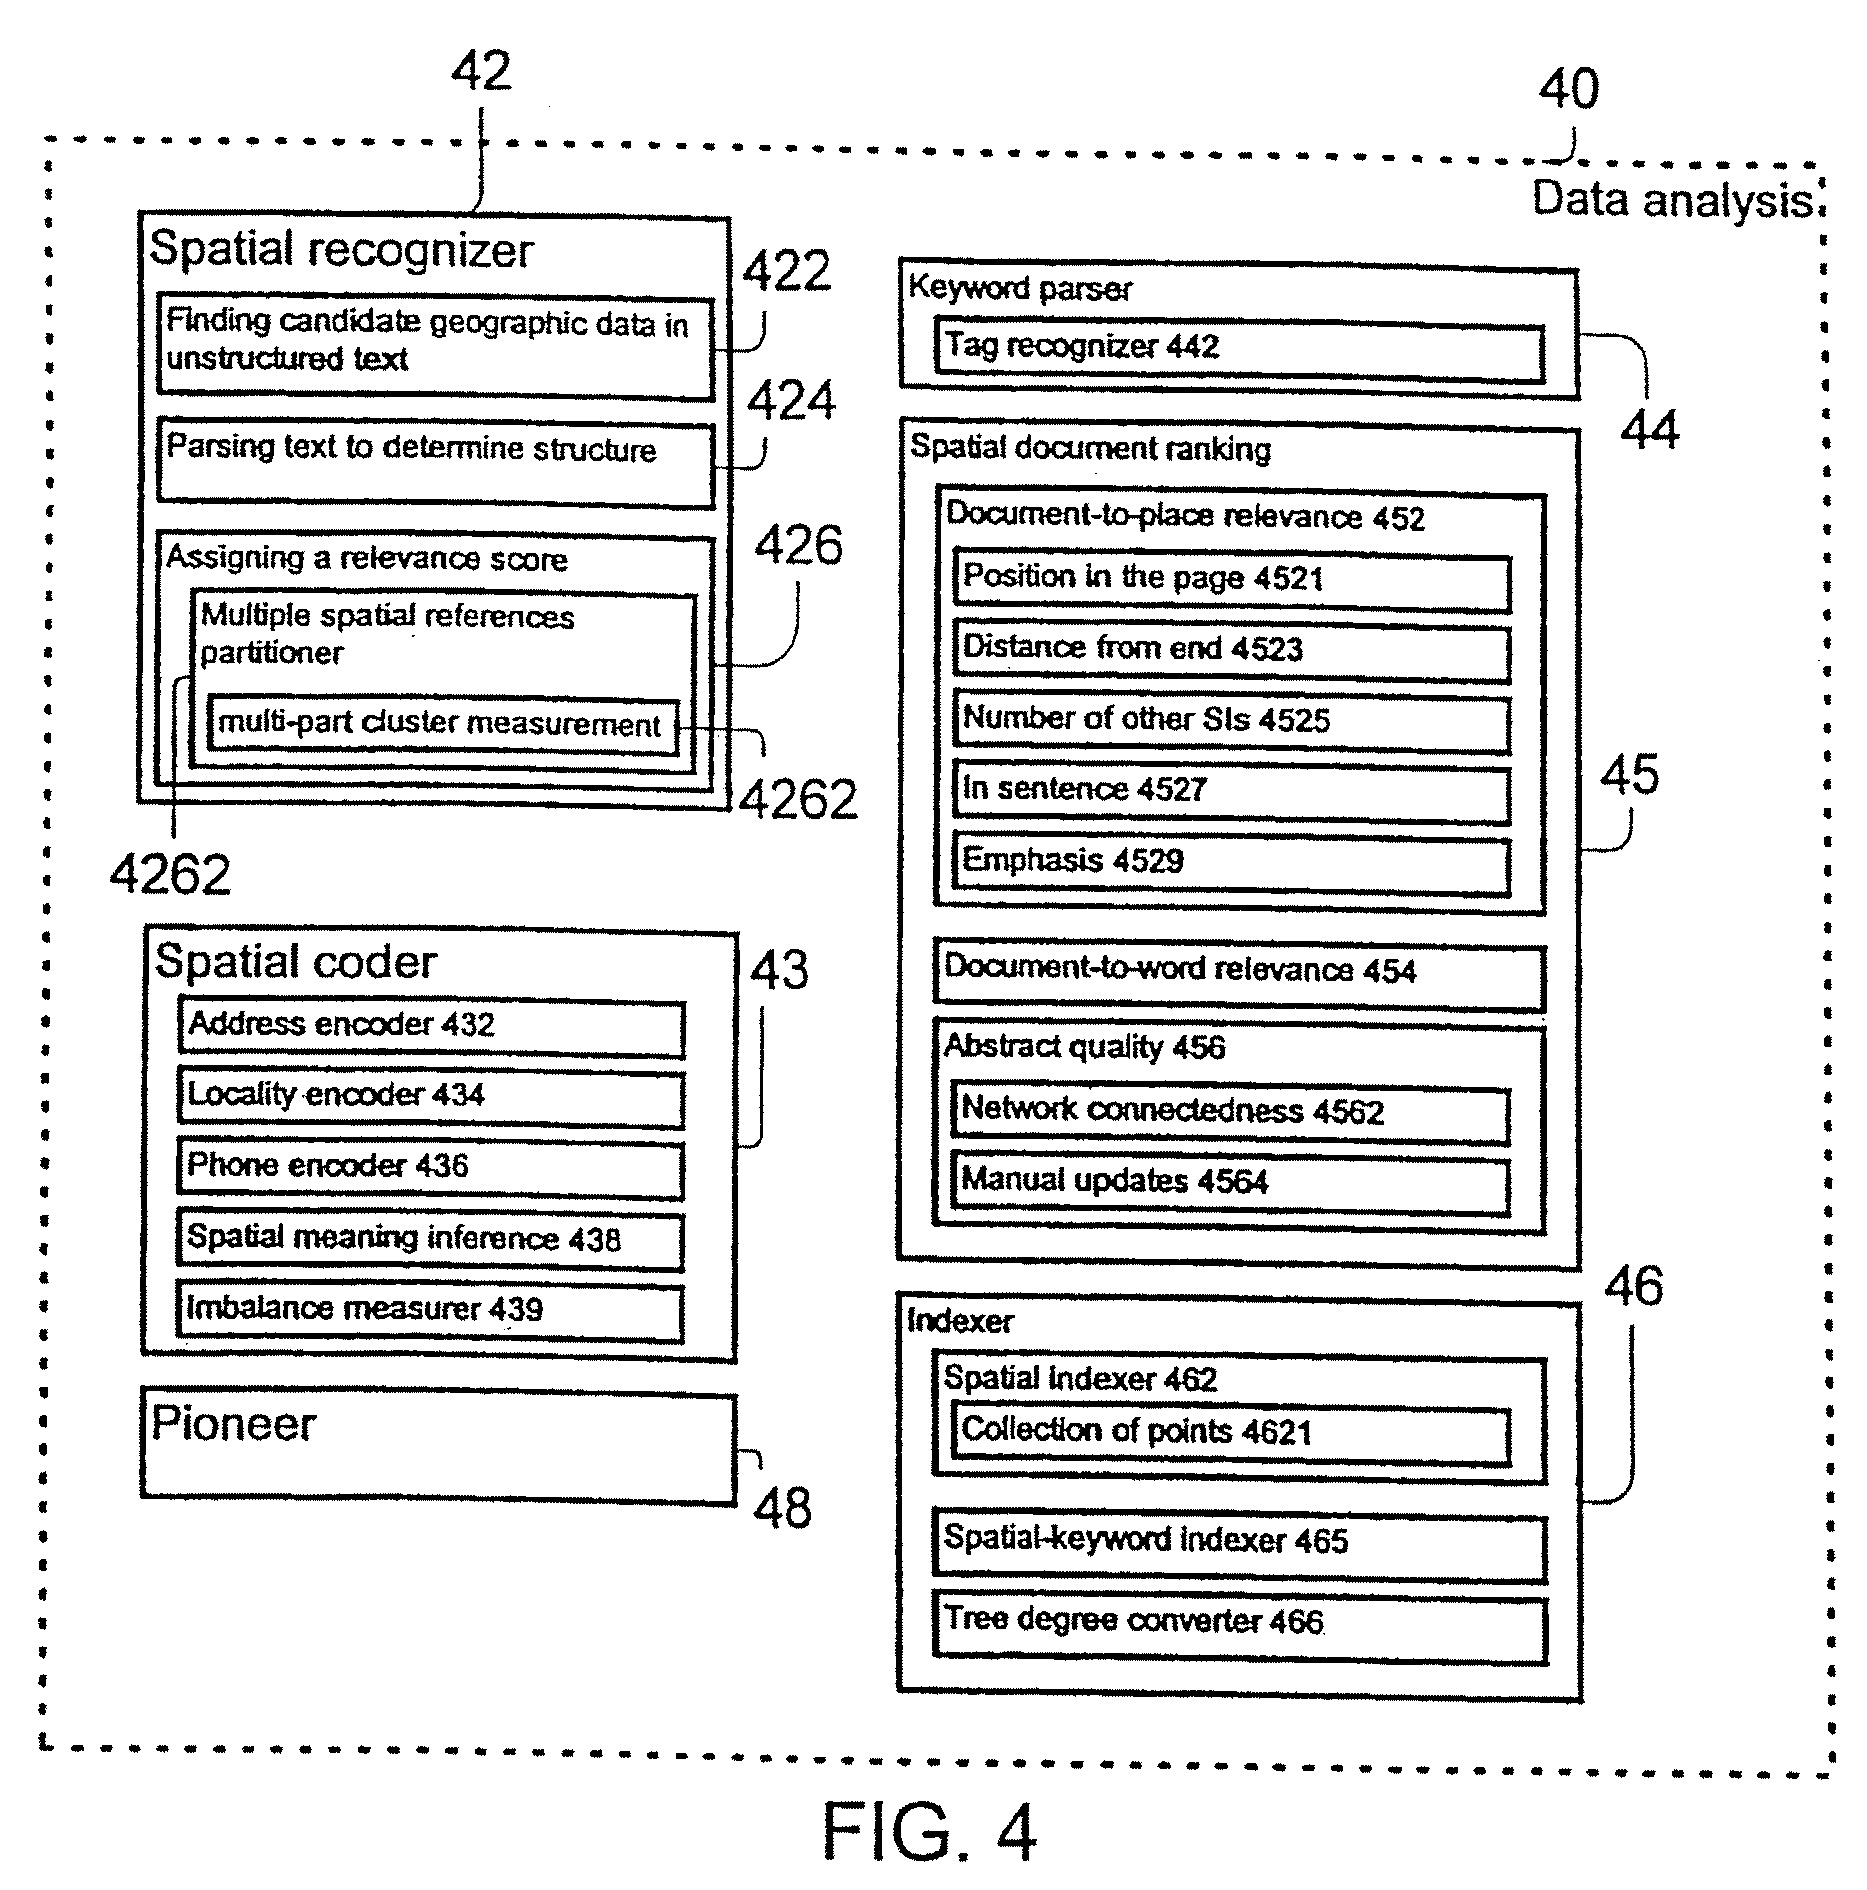 Patent US 7,908,280 B2